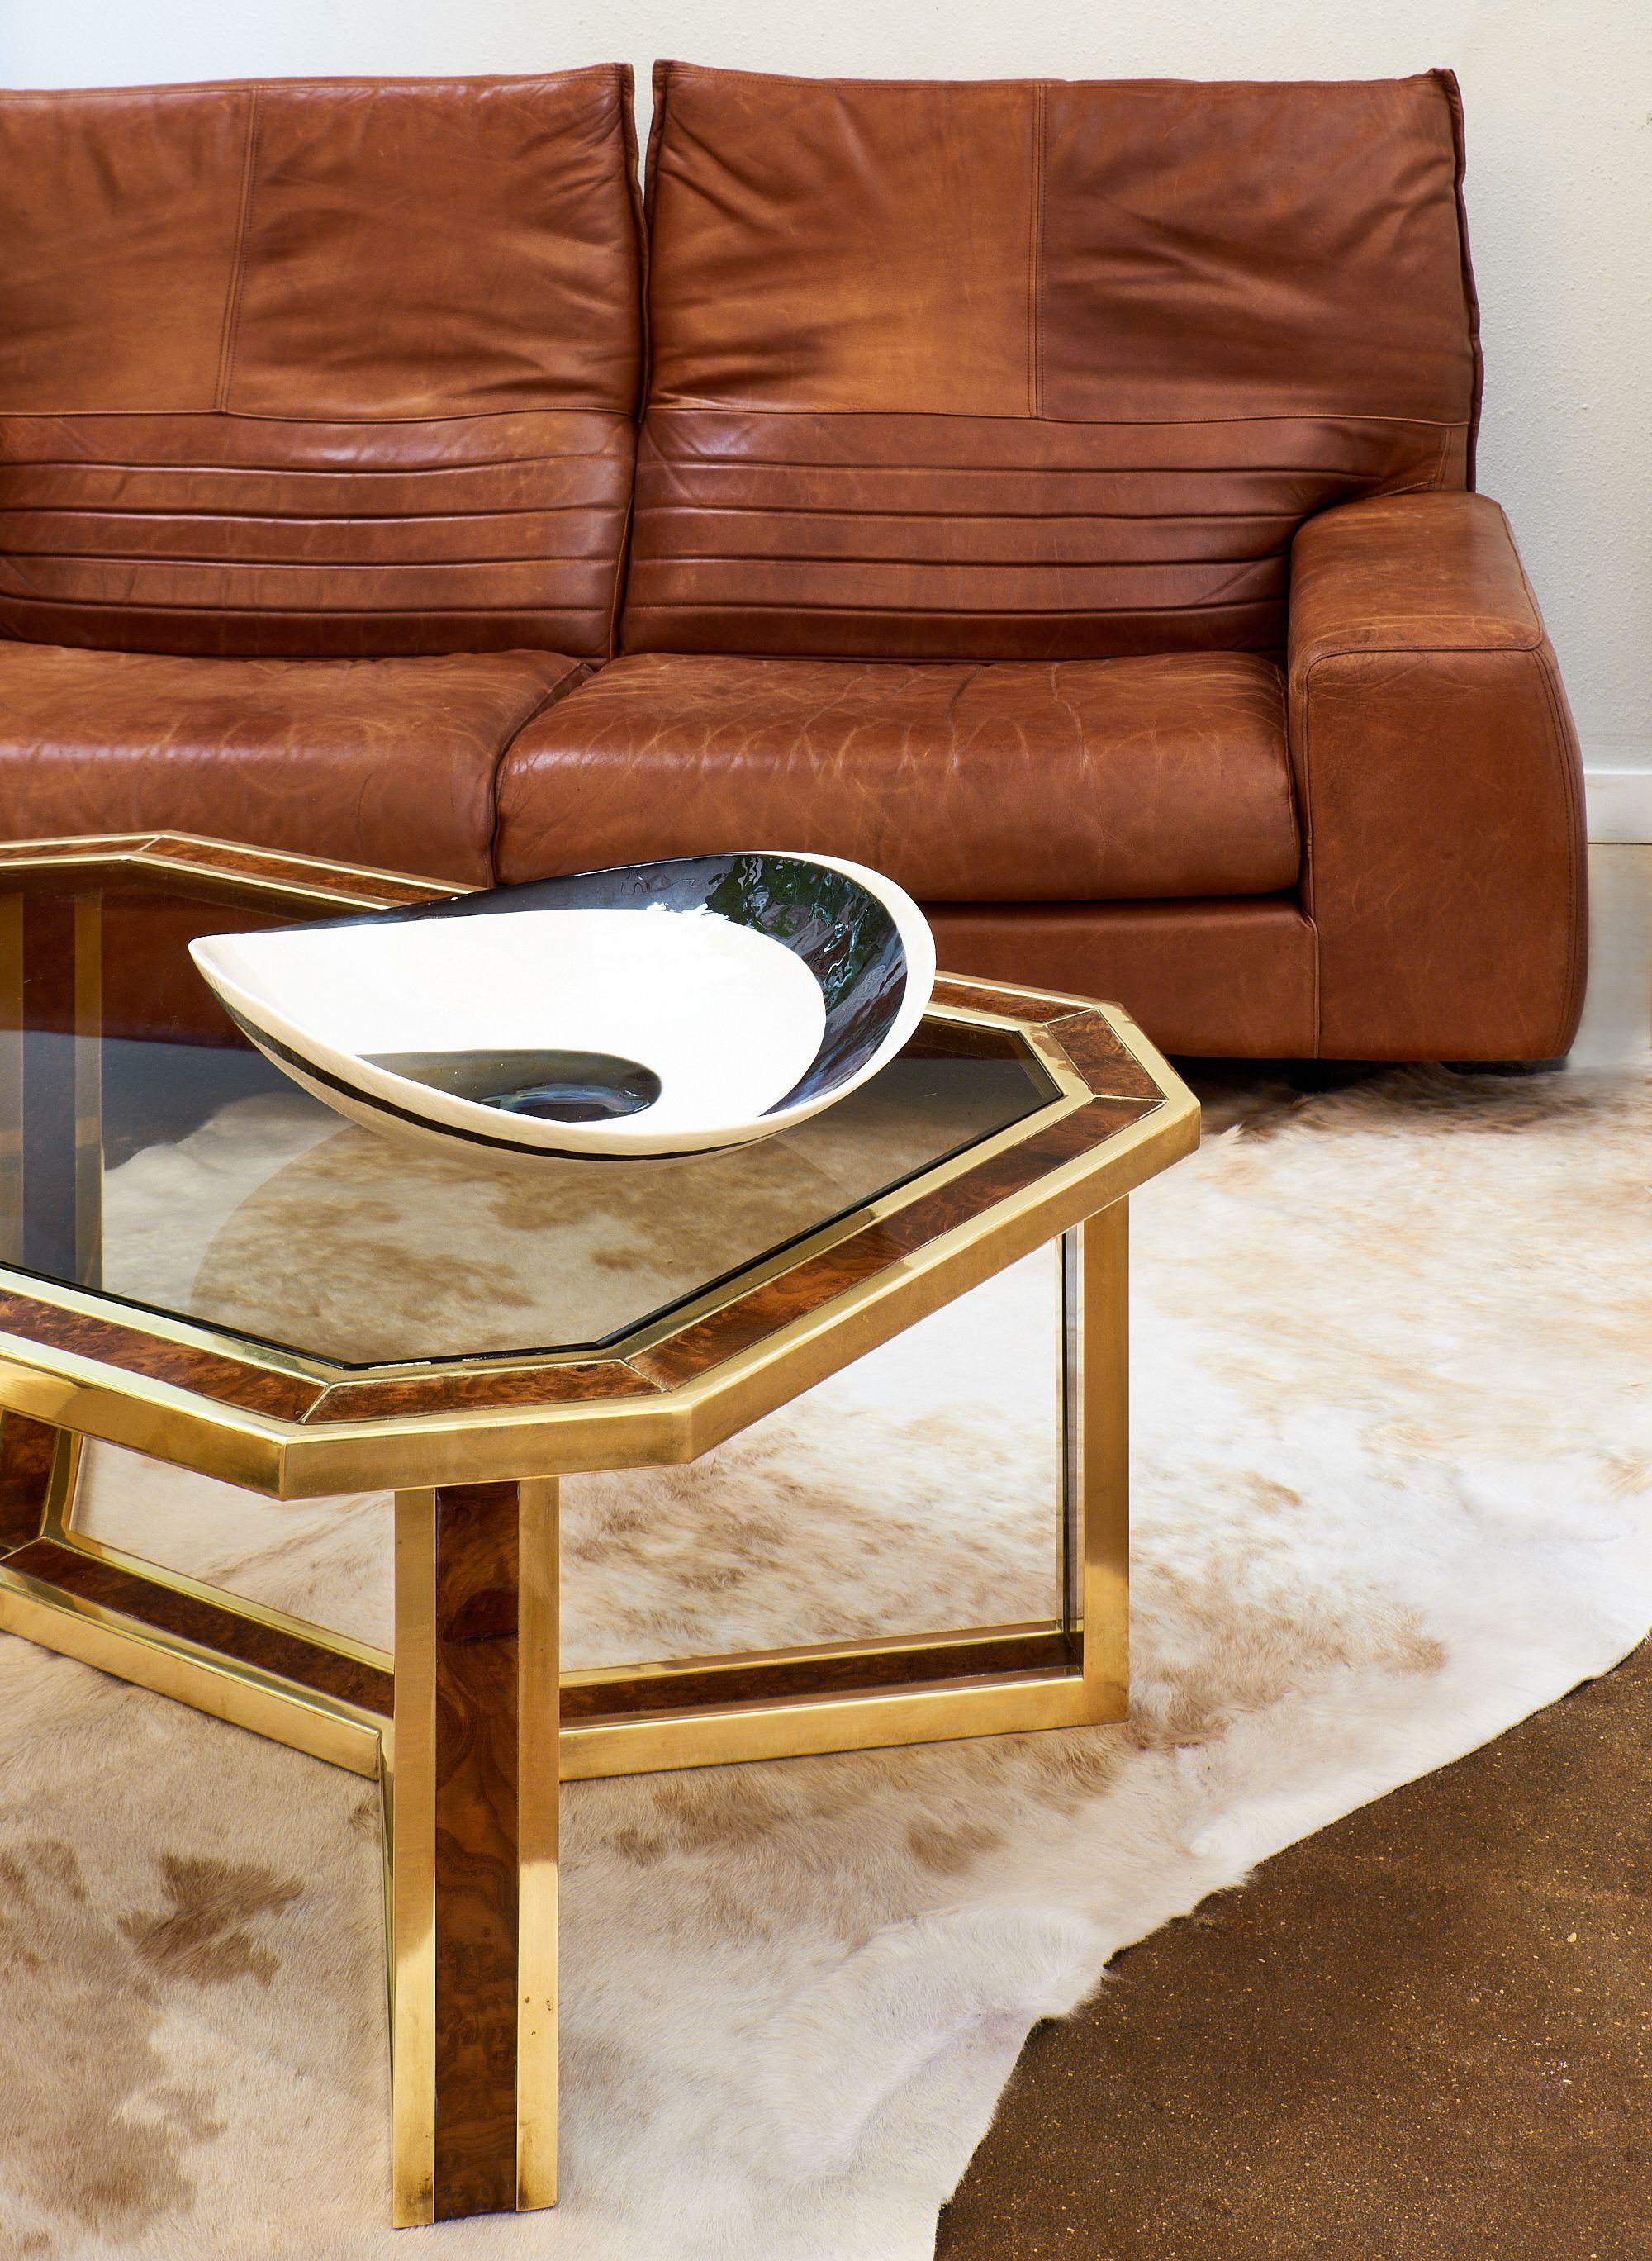 Vintage Italian Leather Sofa With Foldable Back Jean Marc Fray Italian Leather Sofa Leather Sofa Mid Century Modern [ 2737 x 2000 Pixel ]